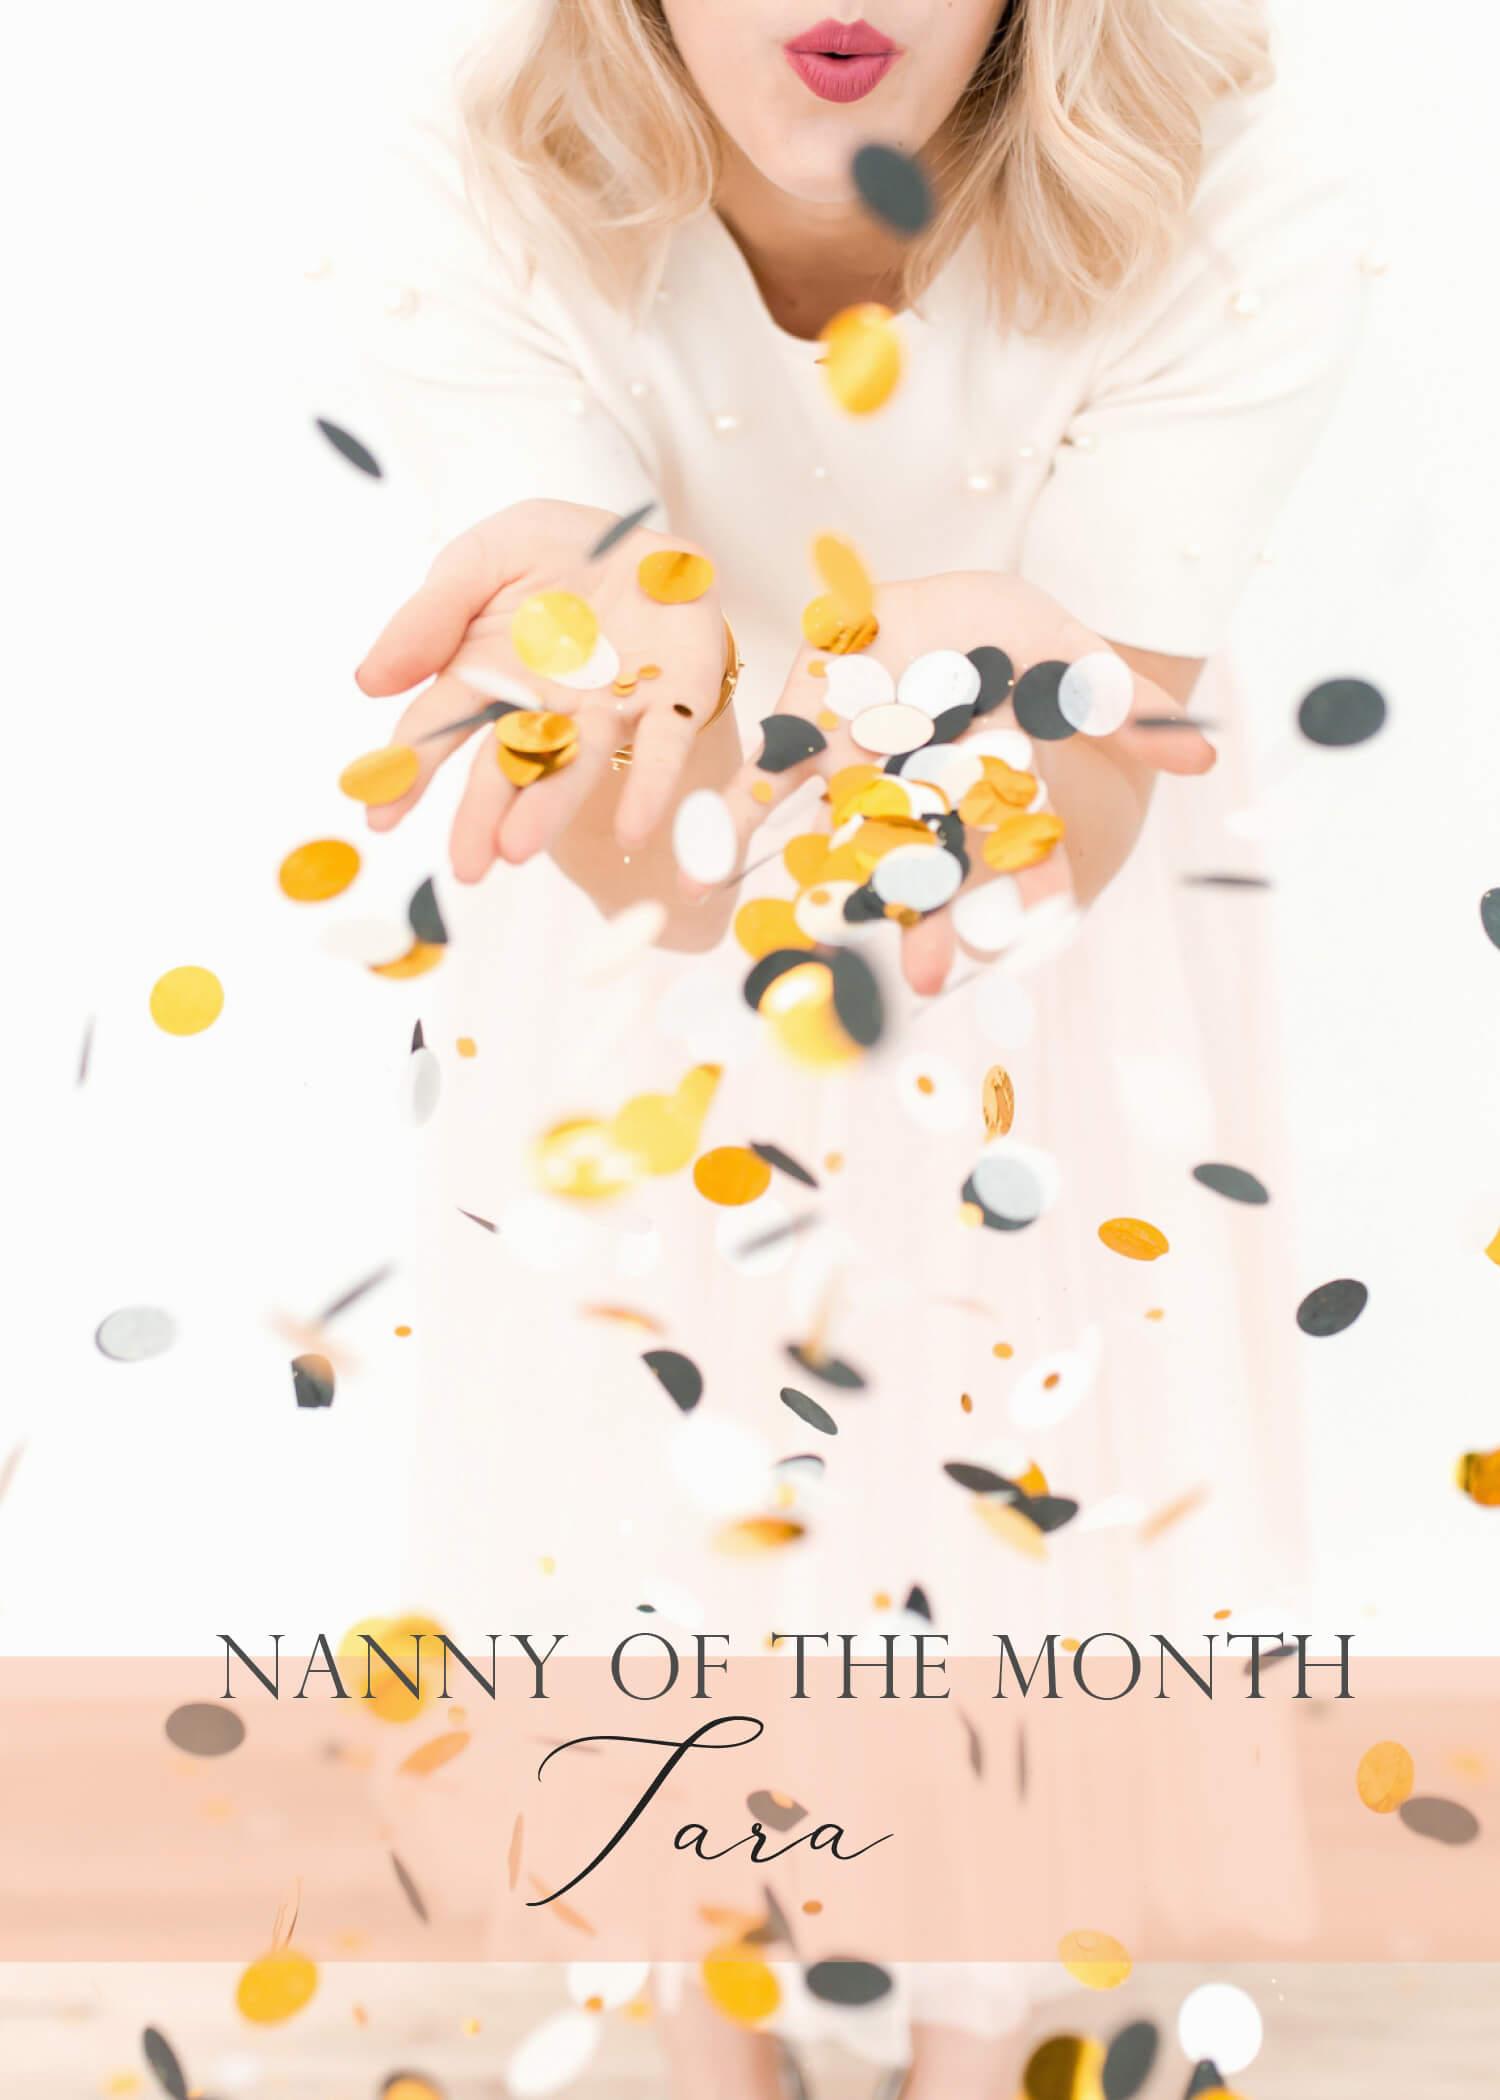 Nanny Of The Month | October 2018 | Meet Tara